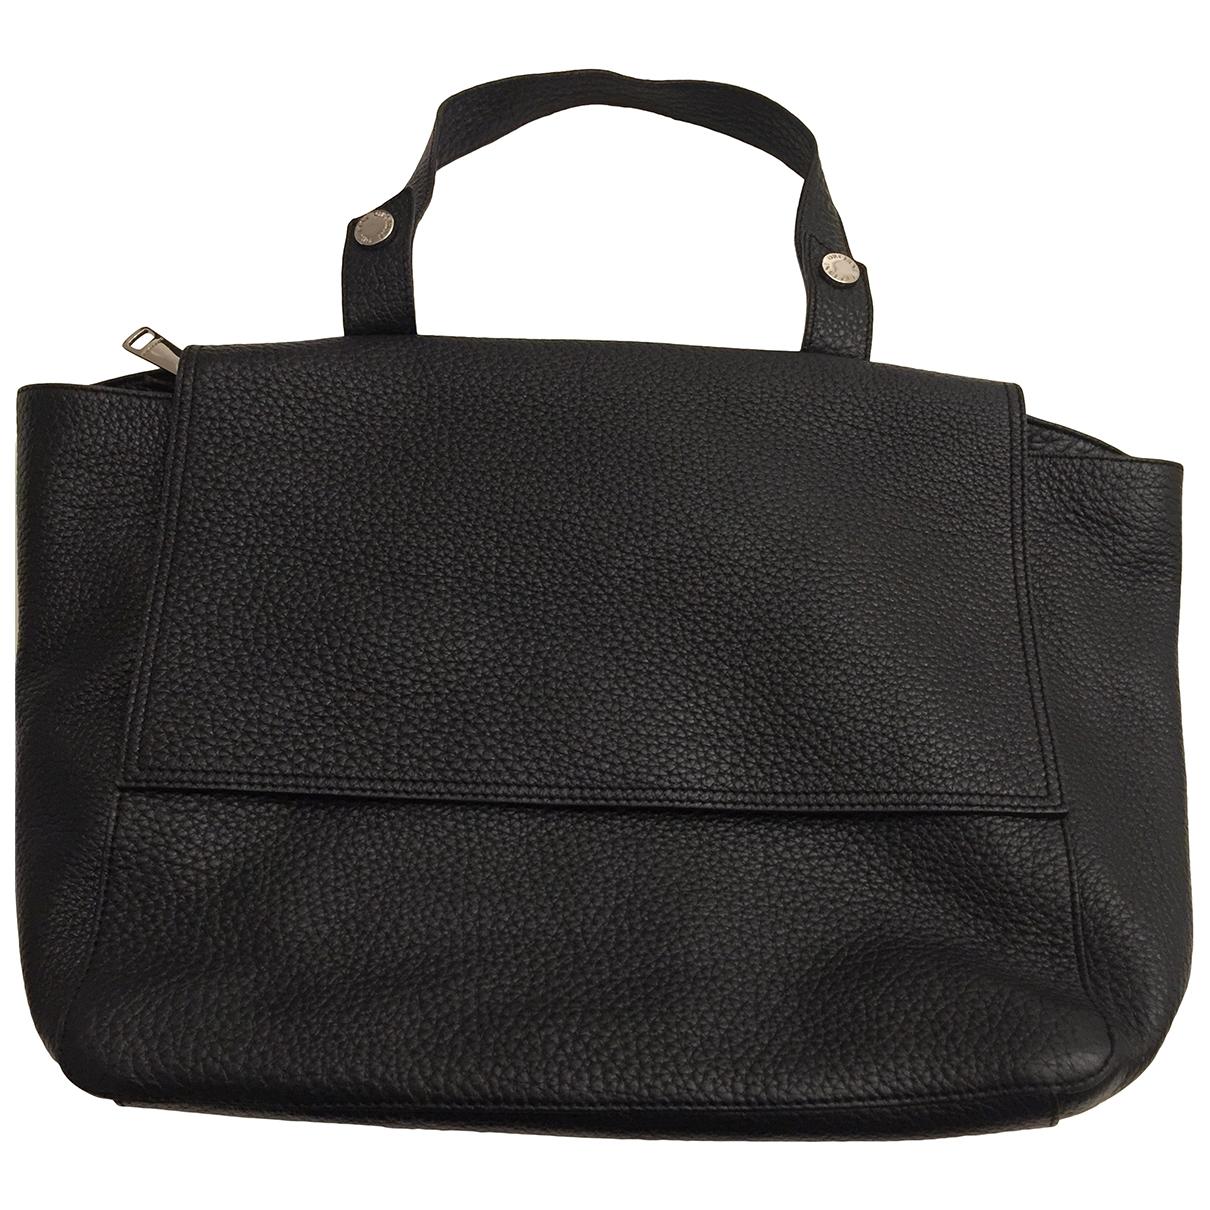 Orciani \N Black Leather handbag for Women \N